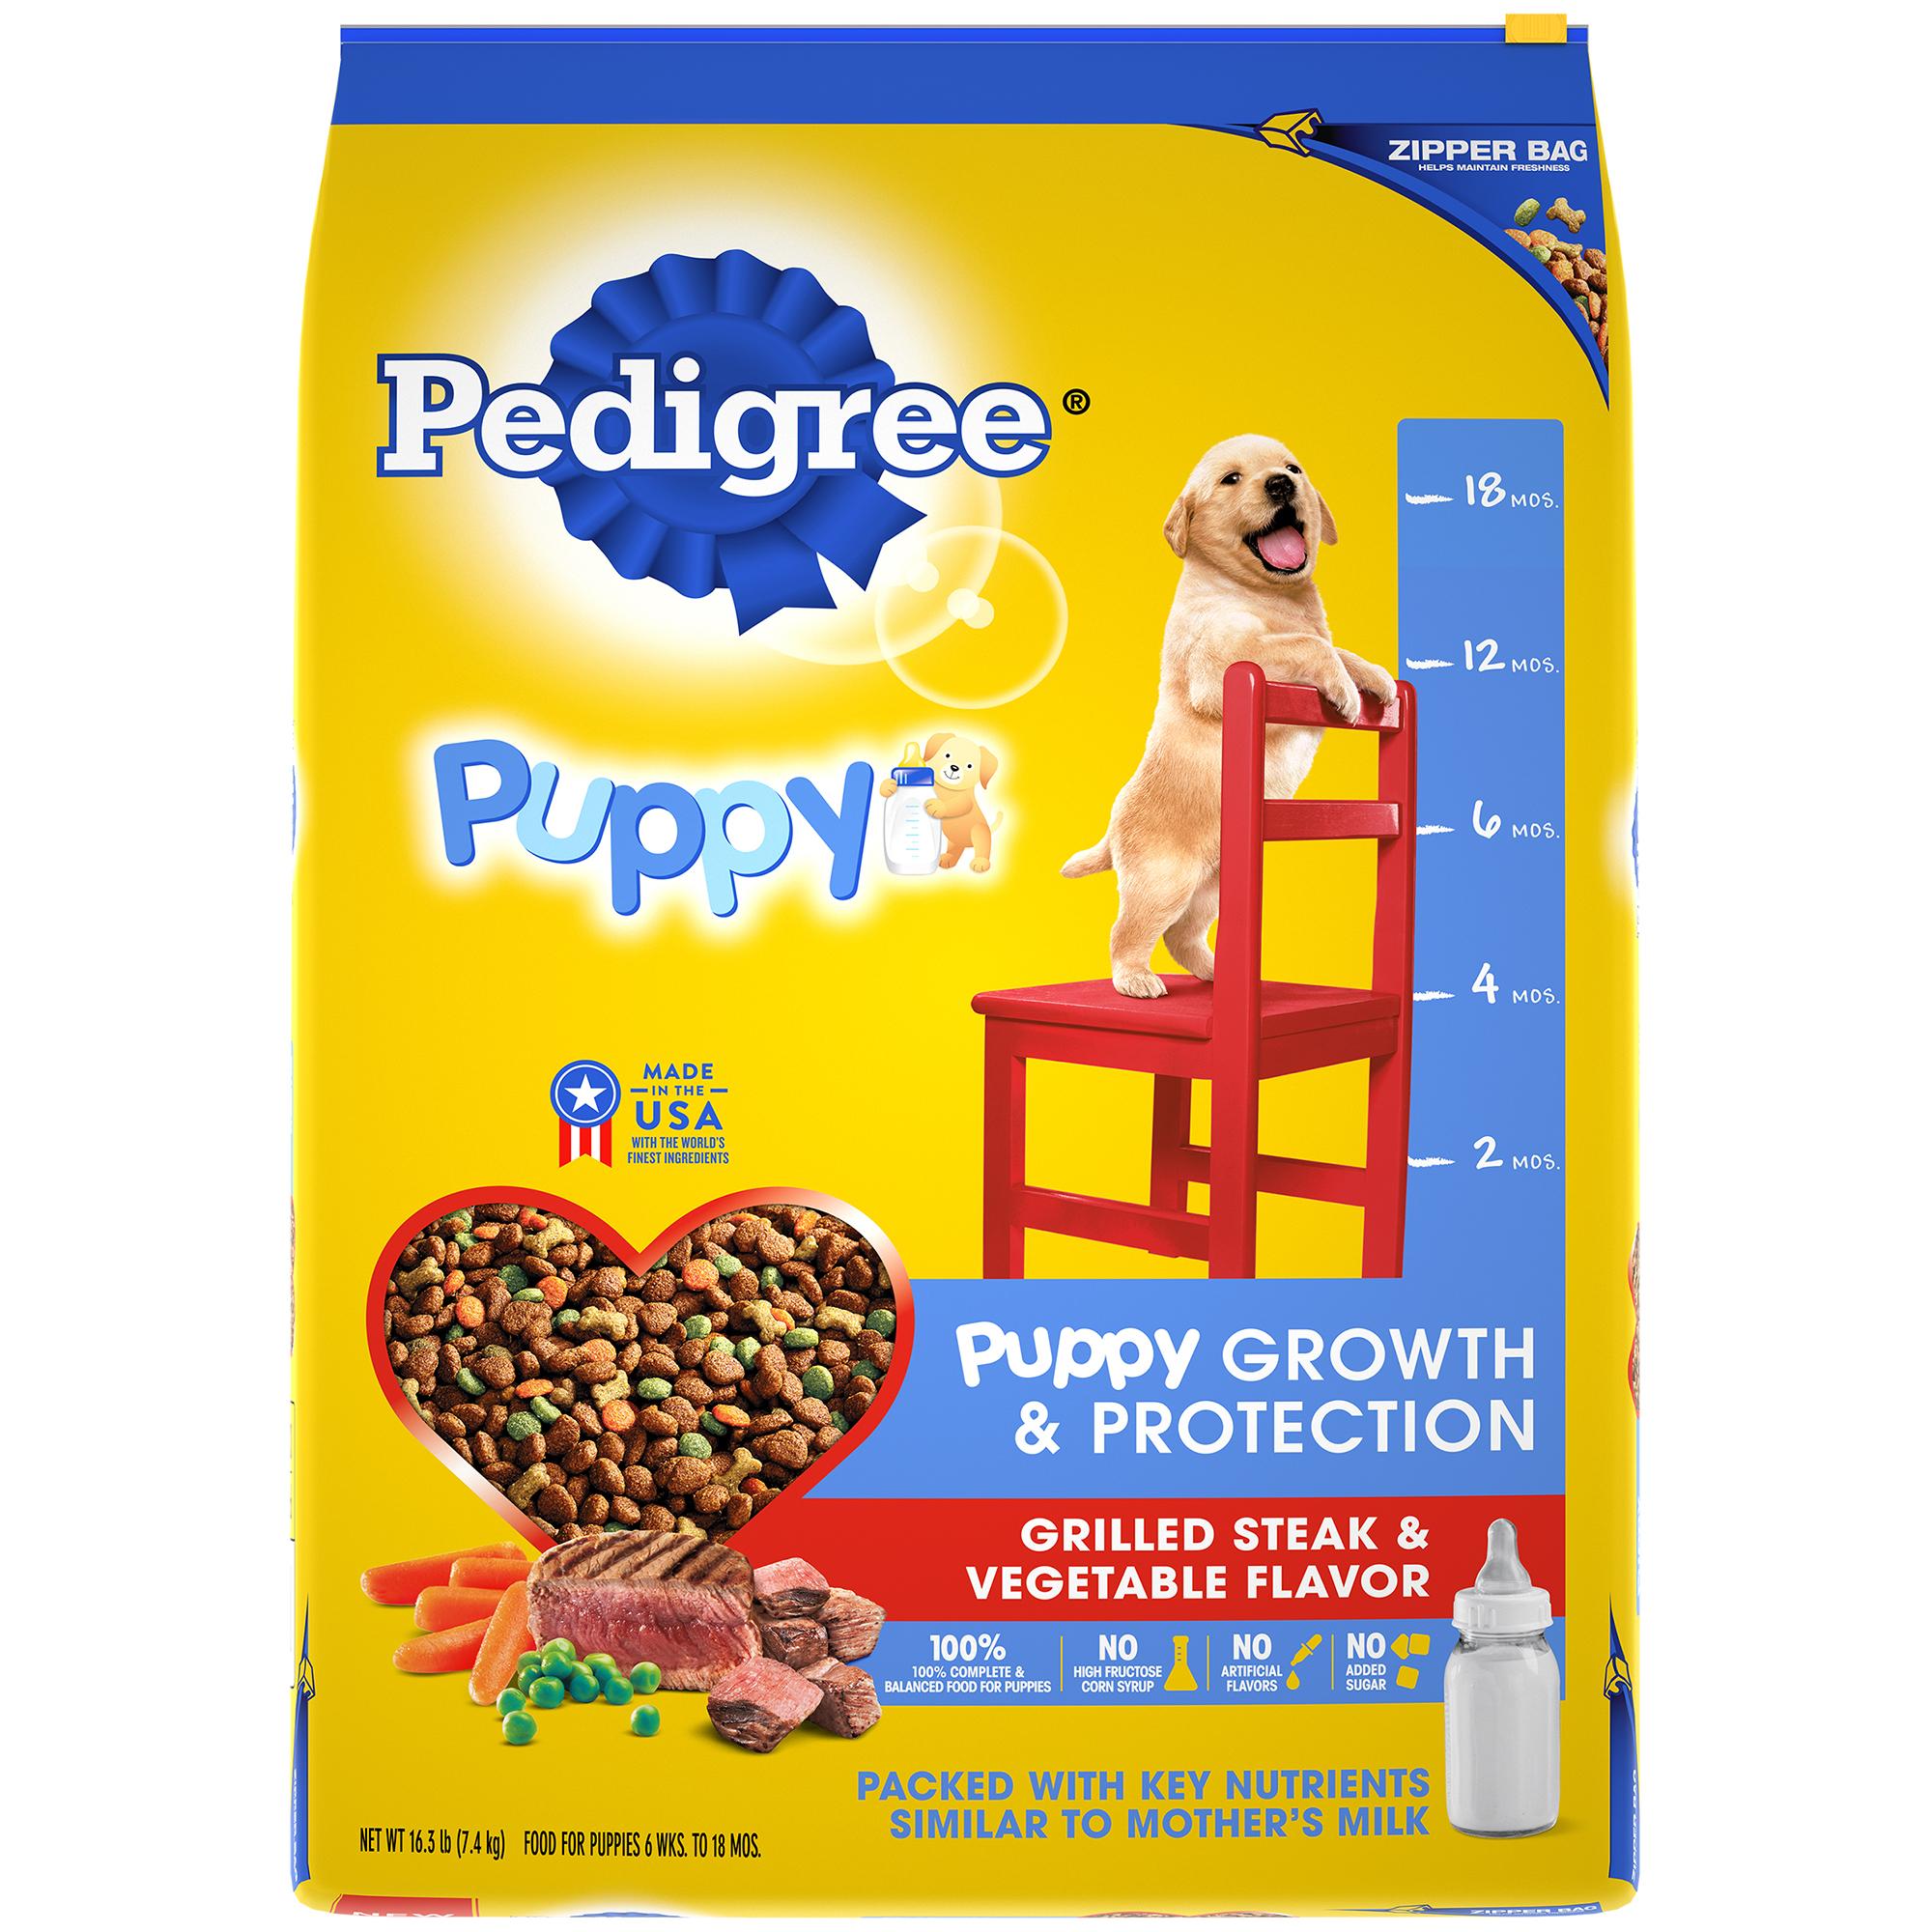 Pedigree Puppy Growth & Protection Dry Dog Food, Grilled Steak & Vegetable Flavor, 16.3 lb. Bag